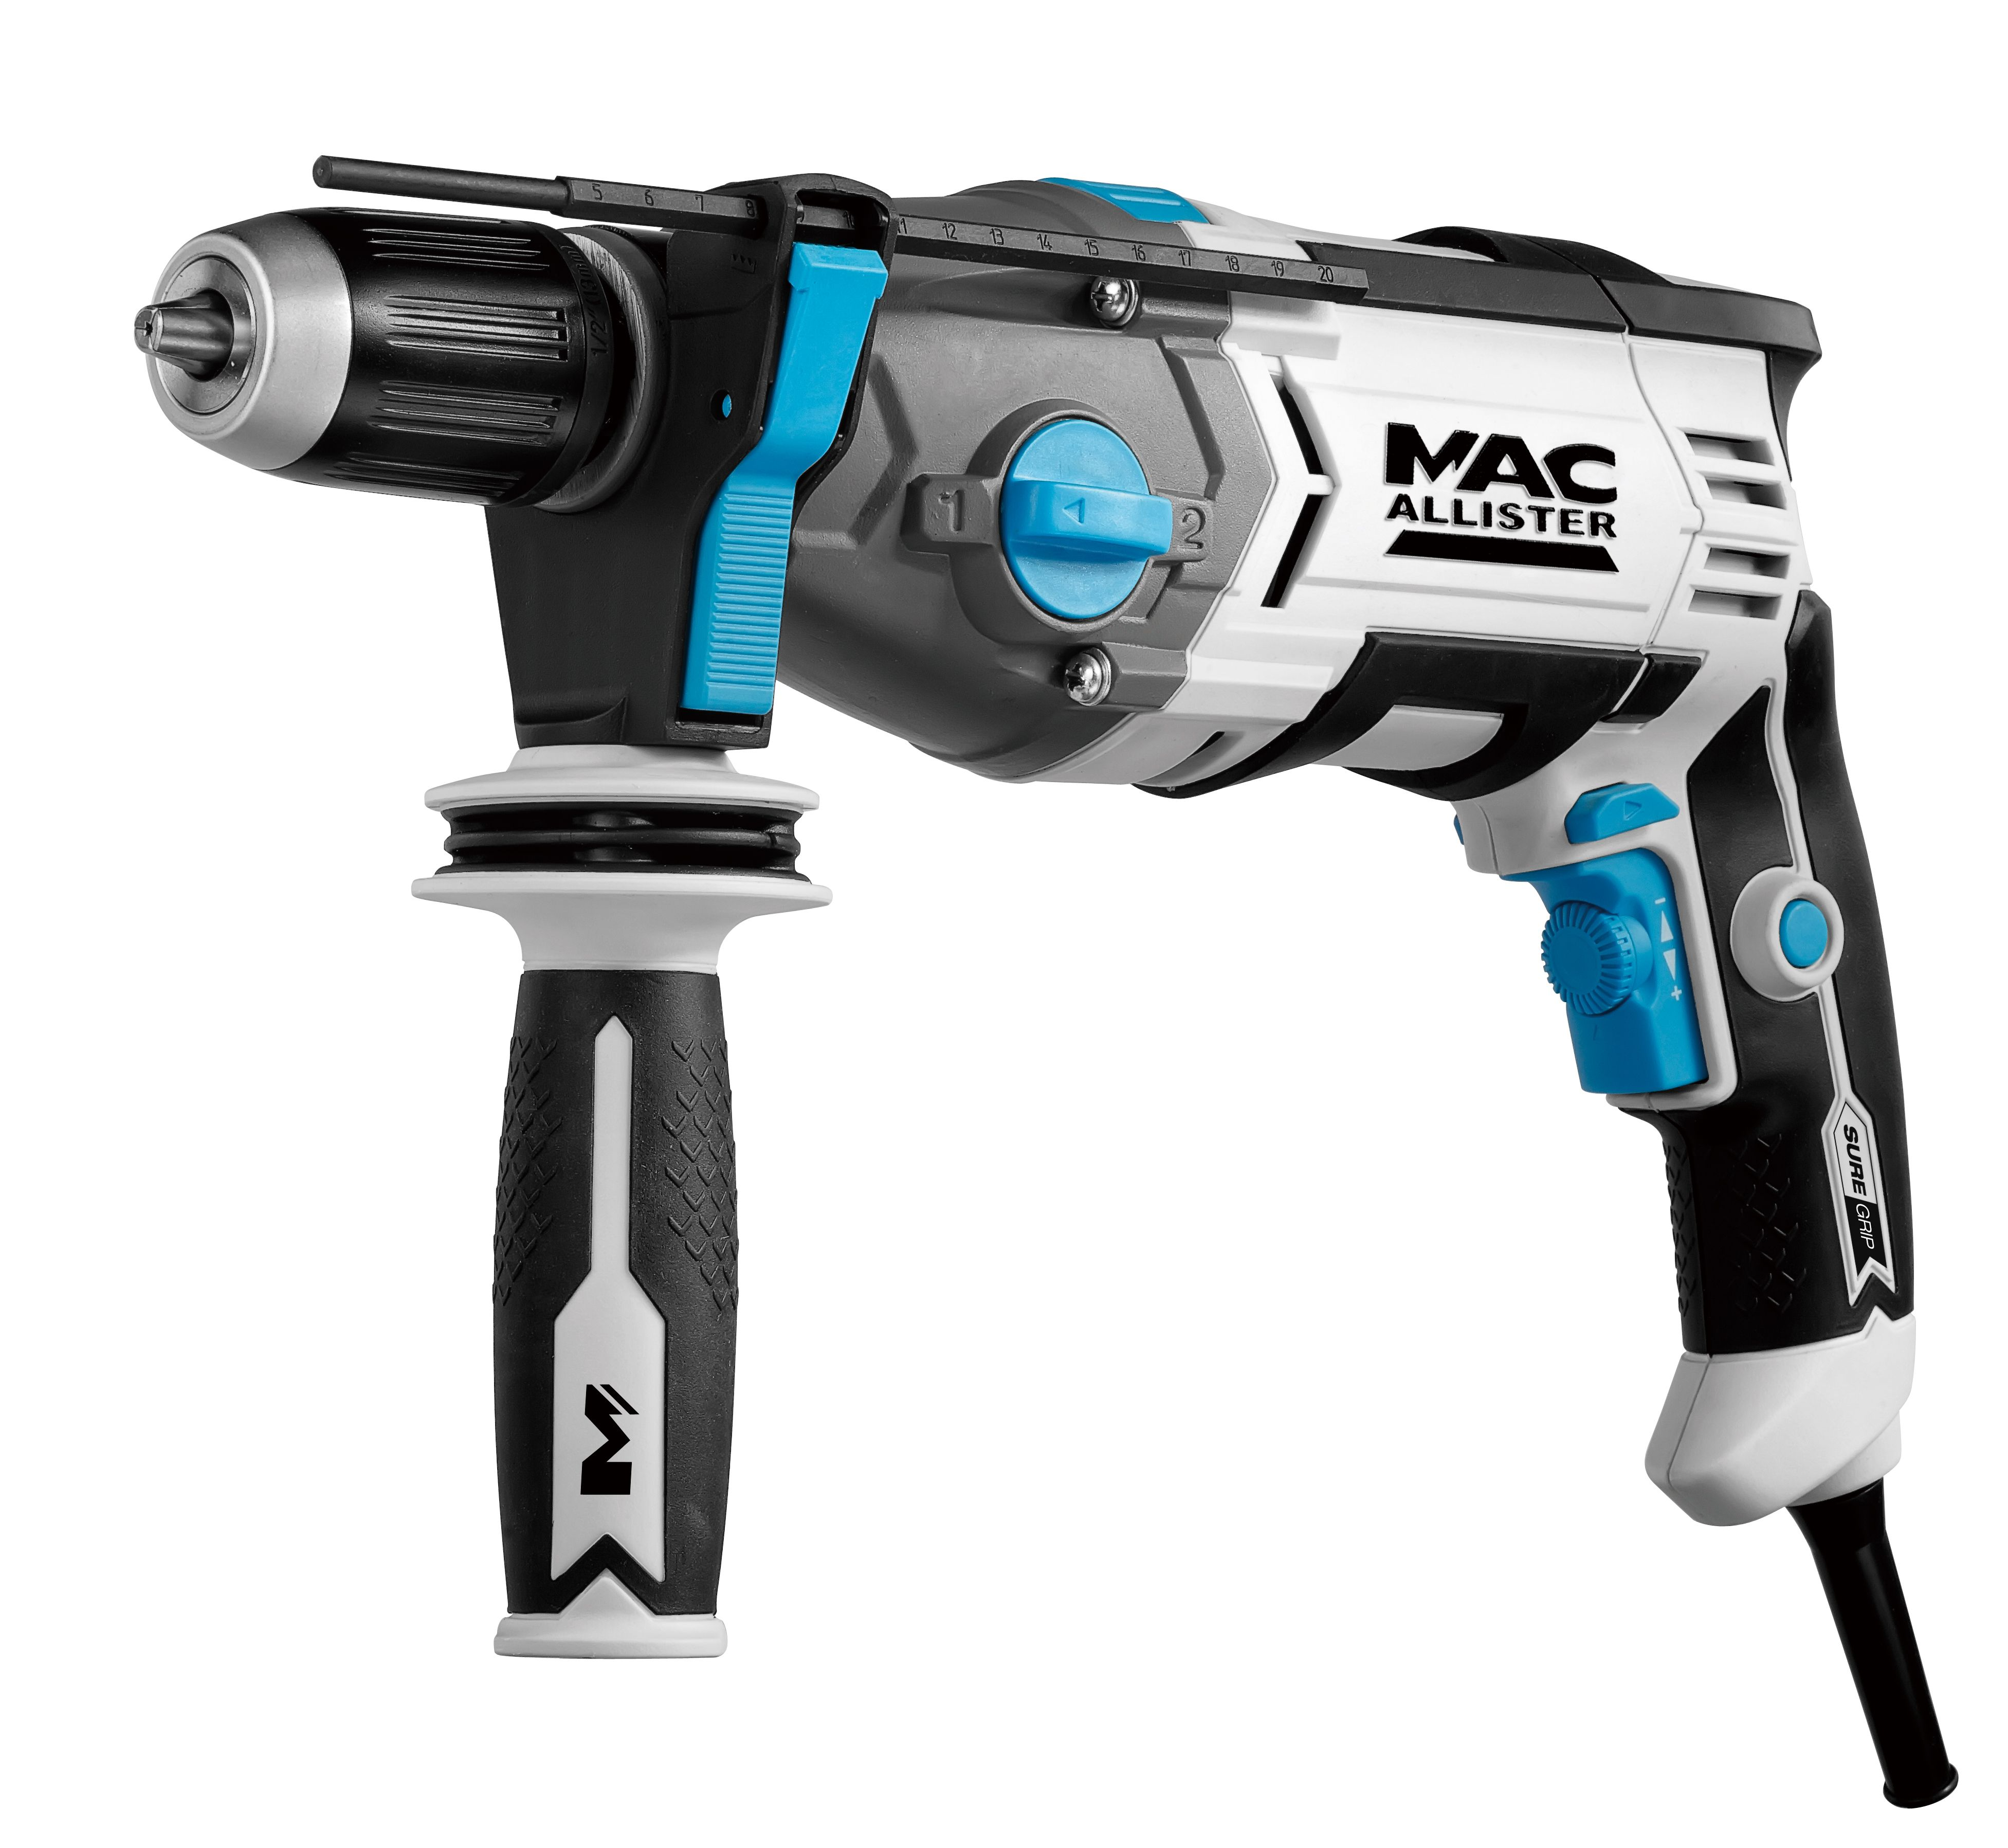 mac allister 900w corded hammer drill mehd900. Black Bedroom Furniture Sets. Home Design Ideas